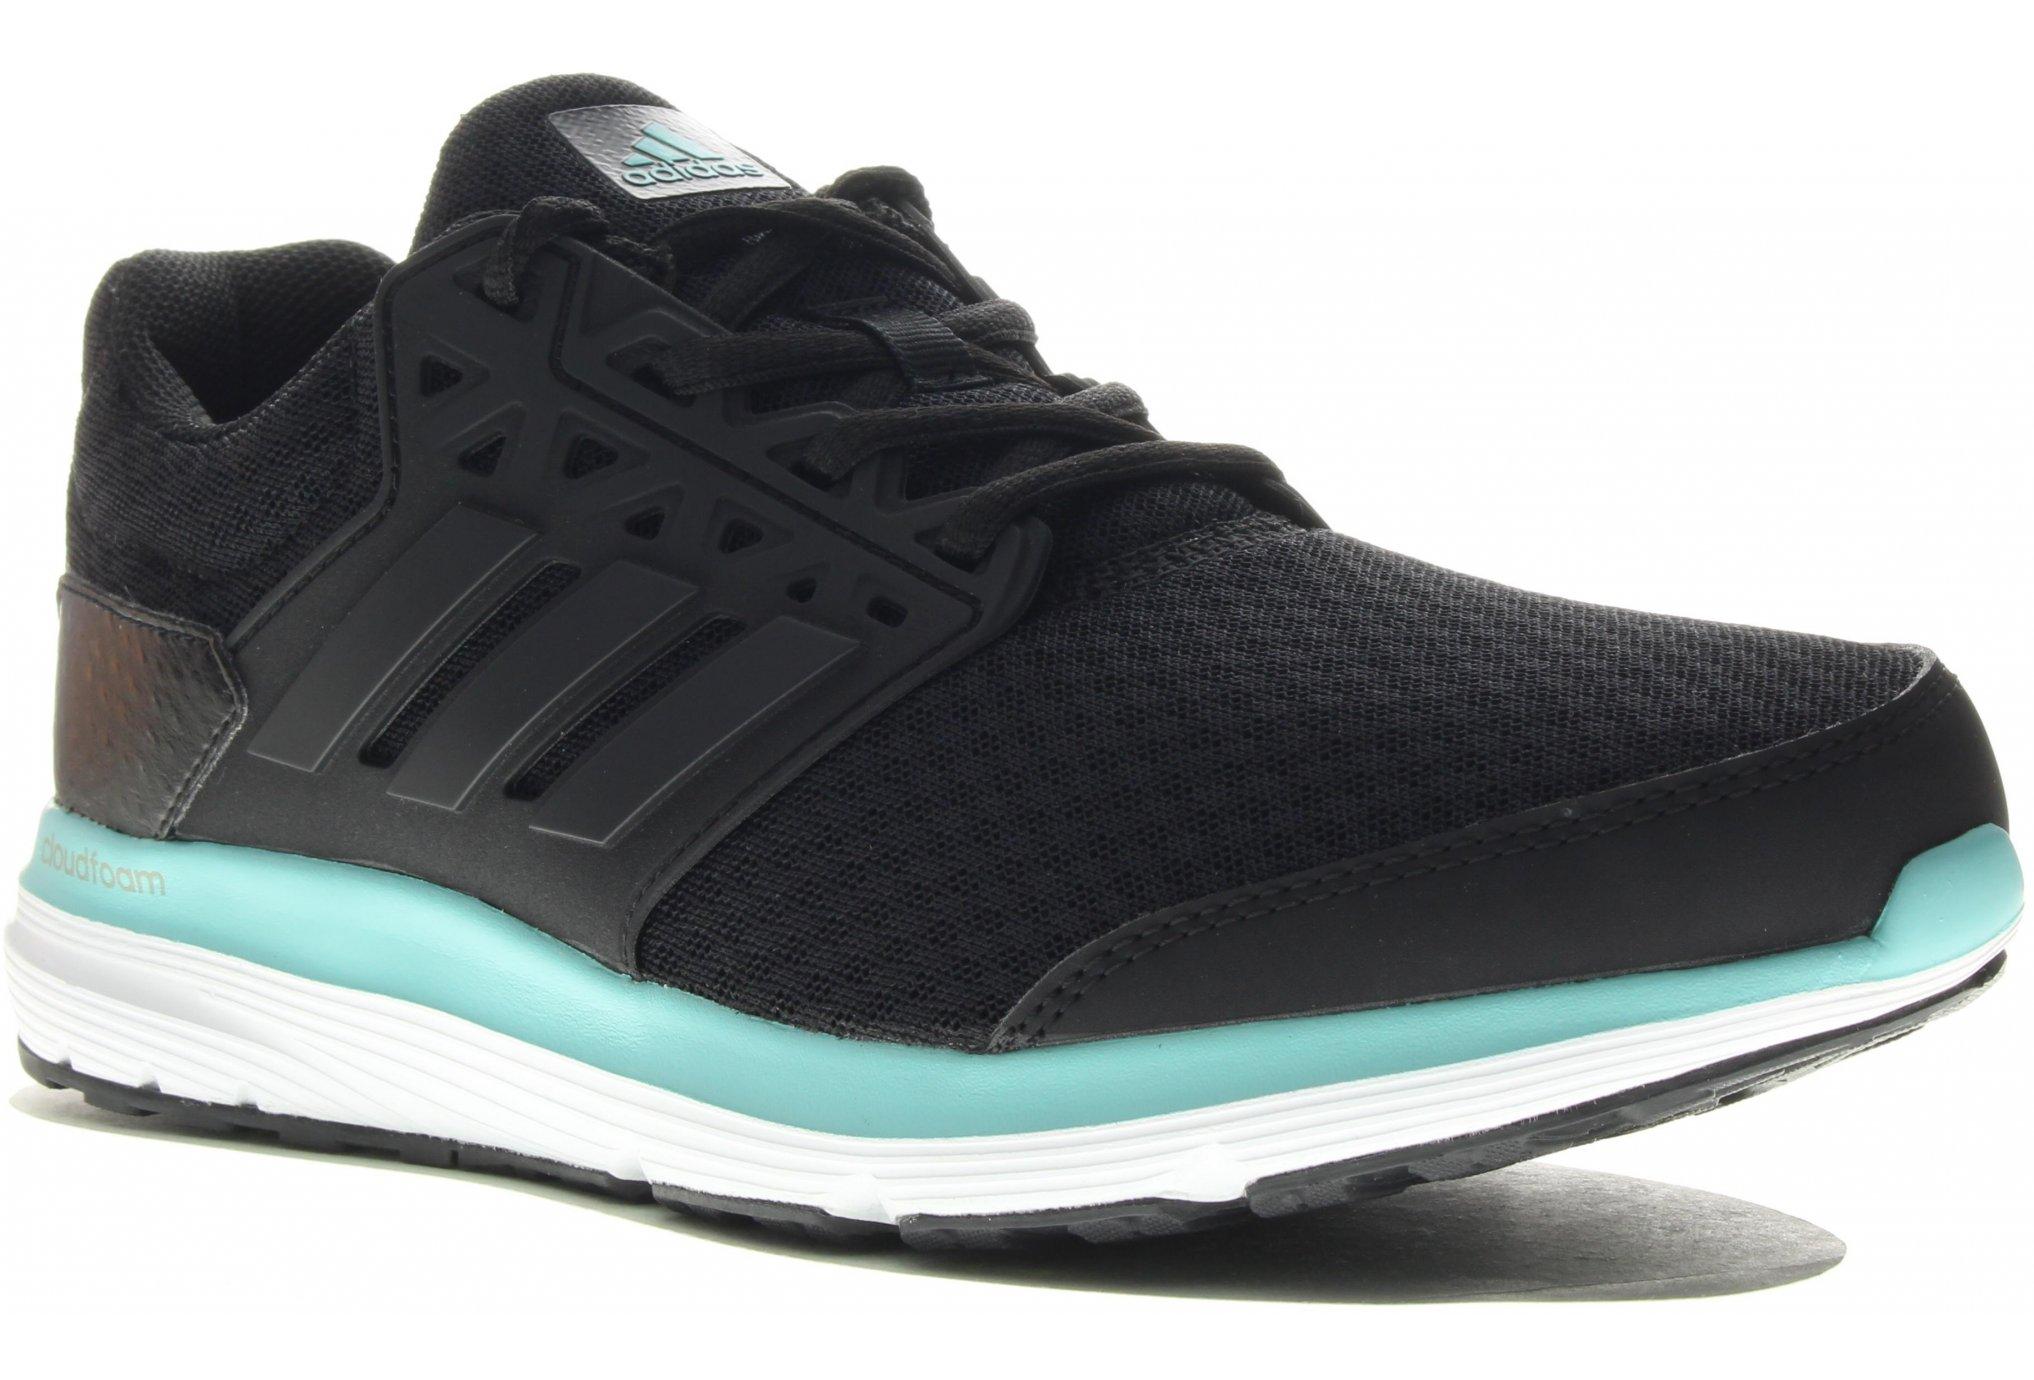 Adidas Galaxy 3.1 w chaussures running femme